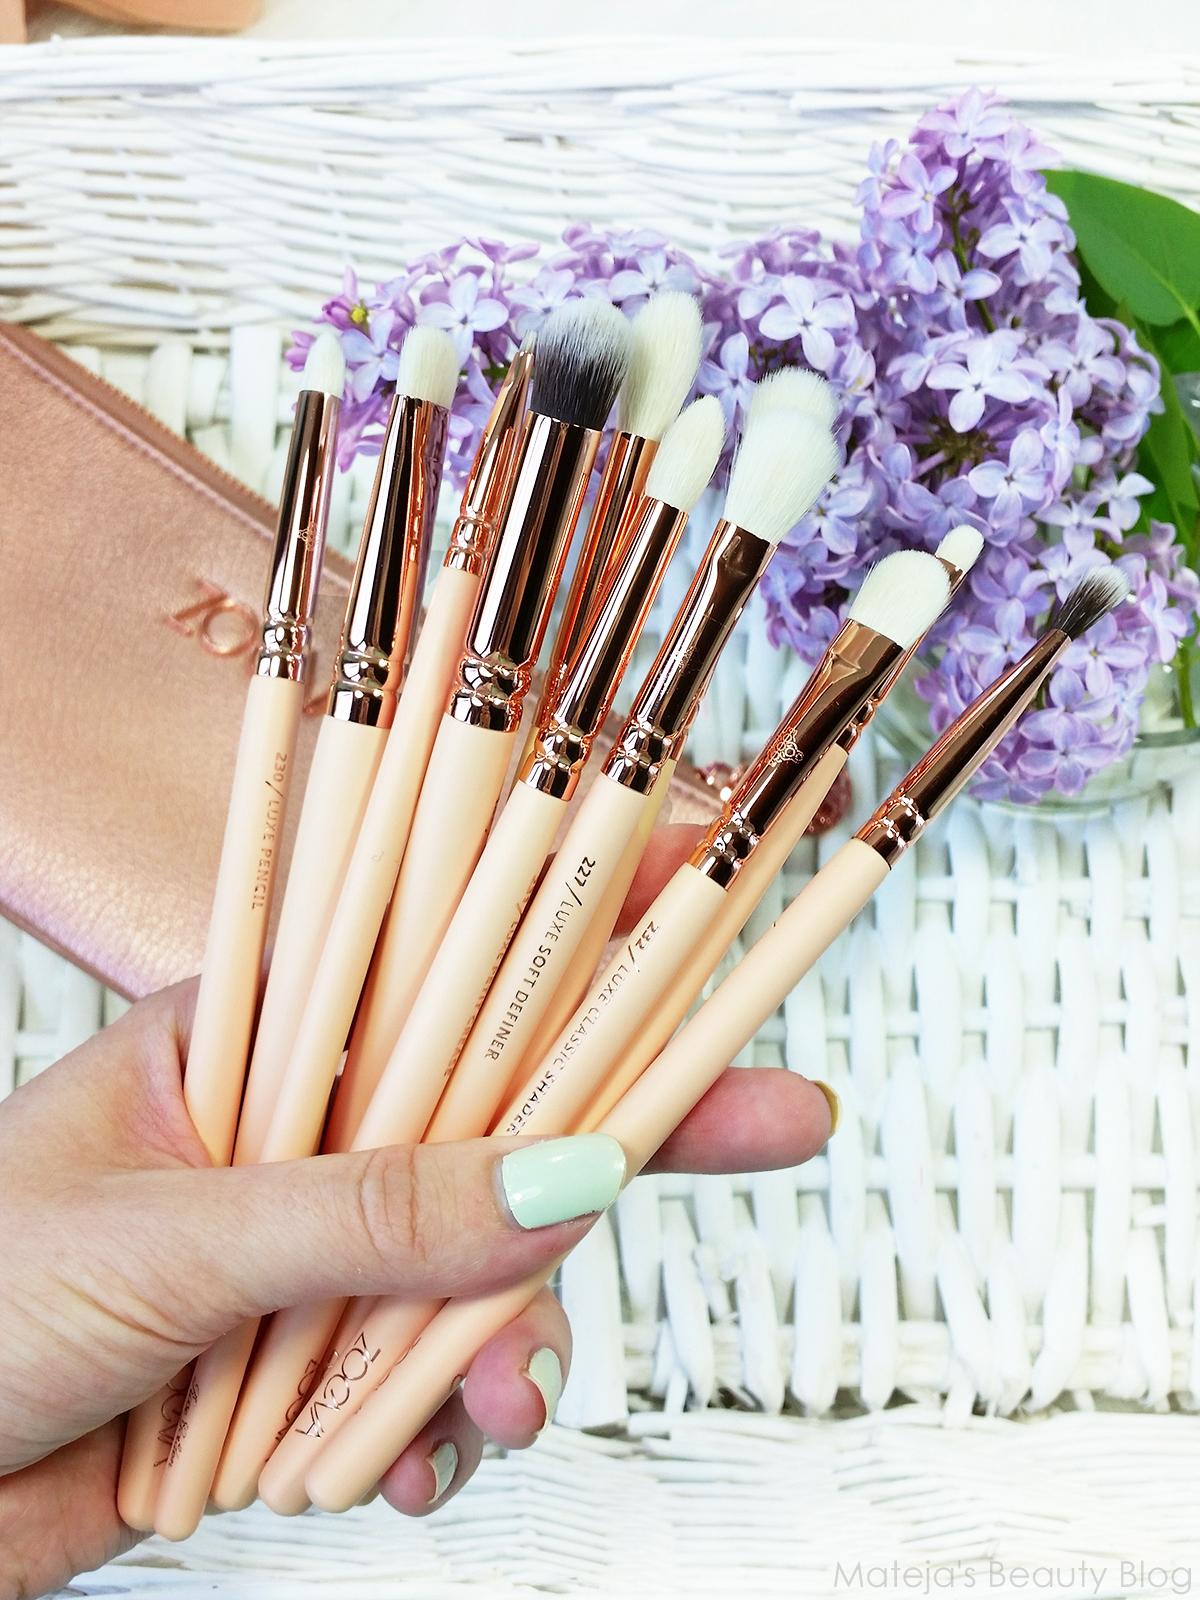 Zoeva Rose Golden Complete Eye Set Vol 2 Matejas Beauty Blog Dark Brown 8 Piece Bursh Bag